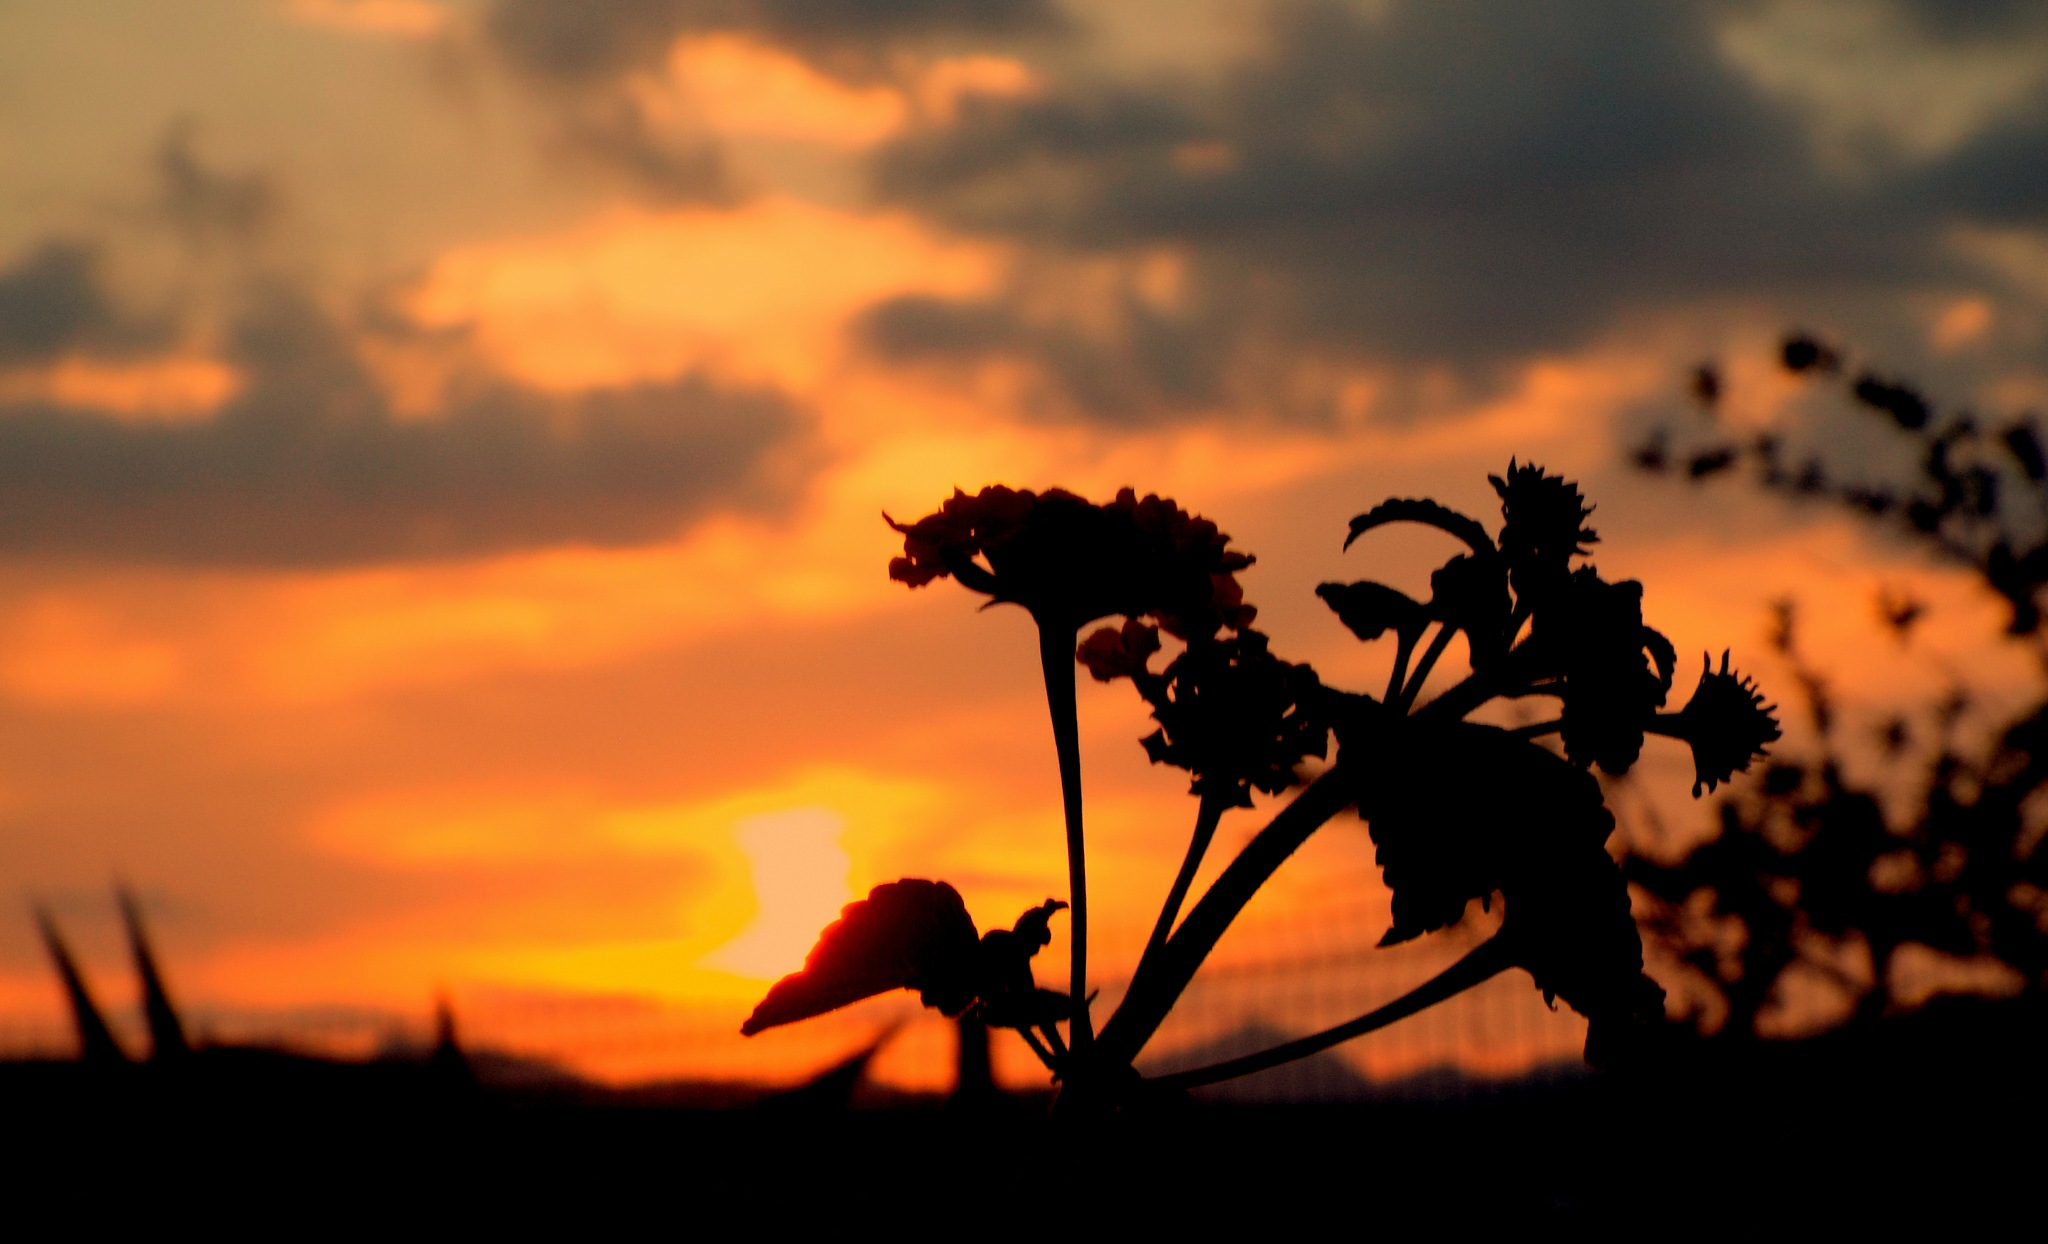 GOODBYE TO THE SUN, FULL SCREEN by Akin Saner